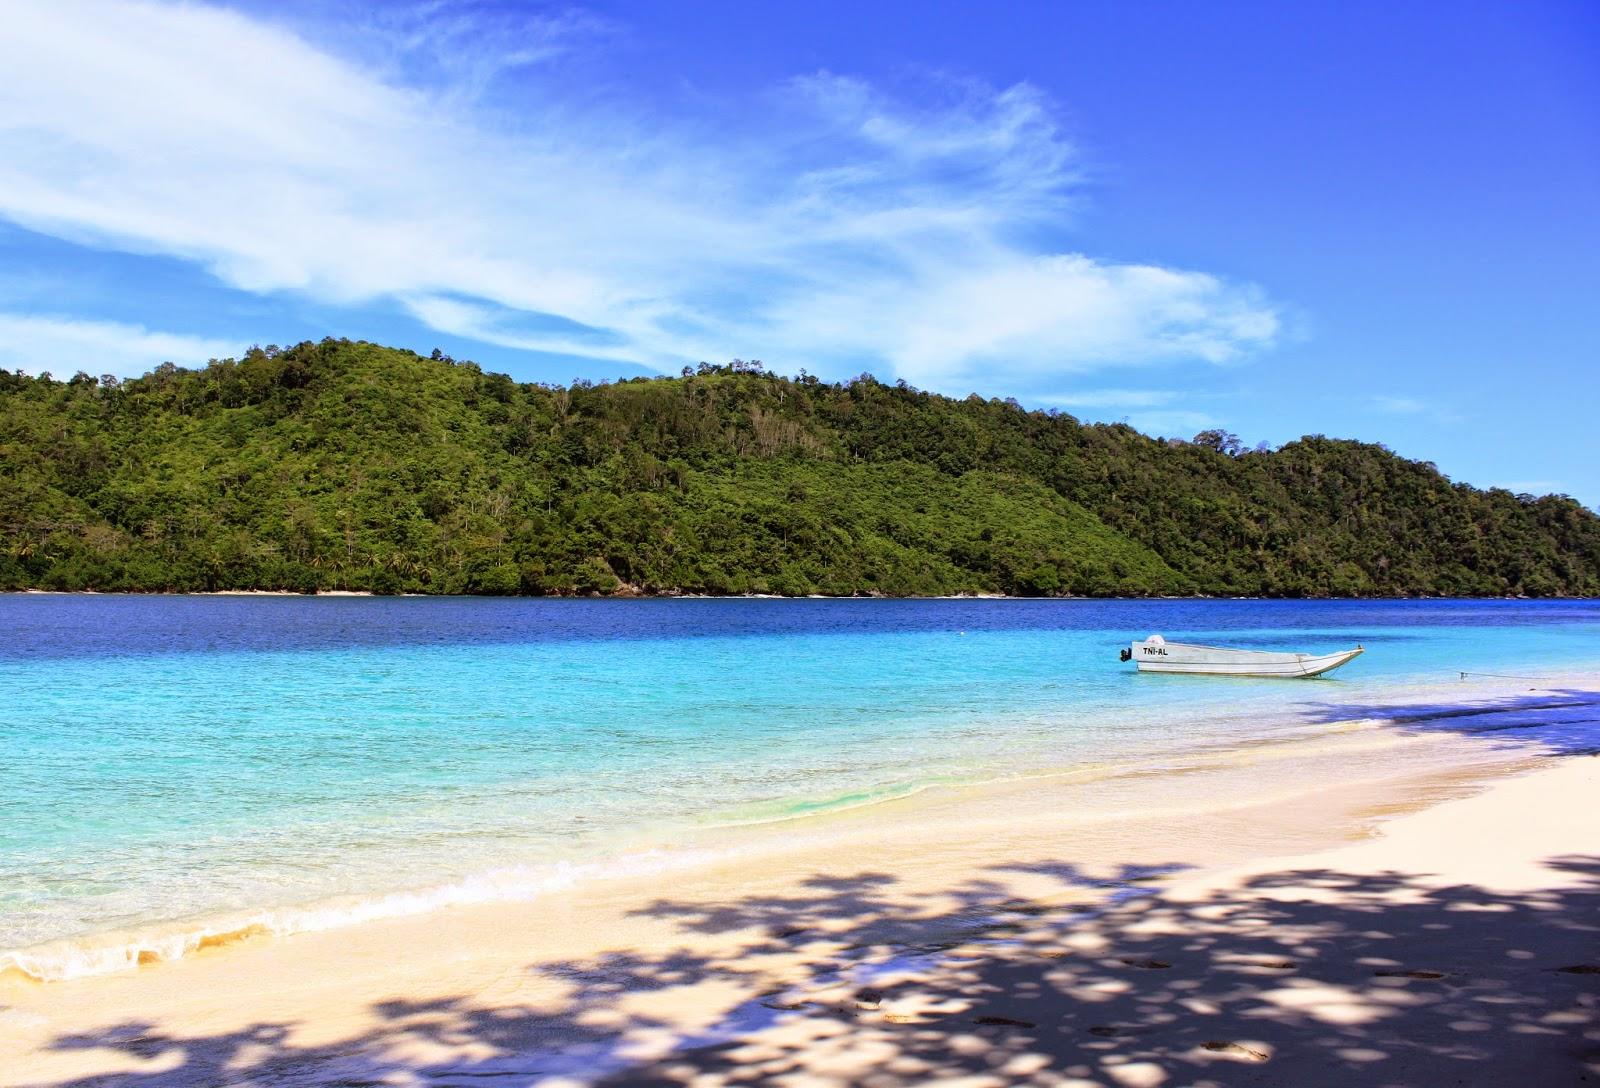 Teluk Kiluan, Tempat Wisata Terbaik Di Lampung